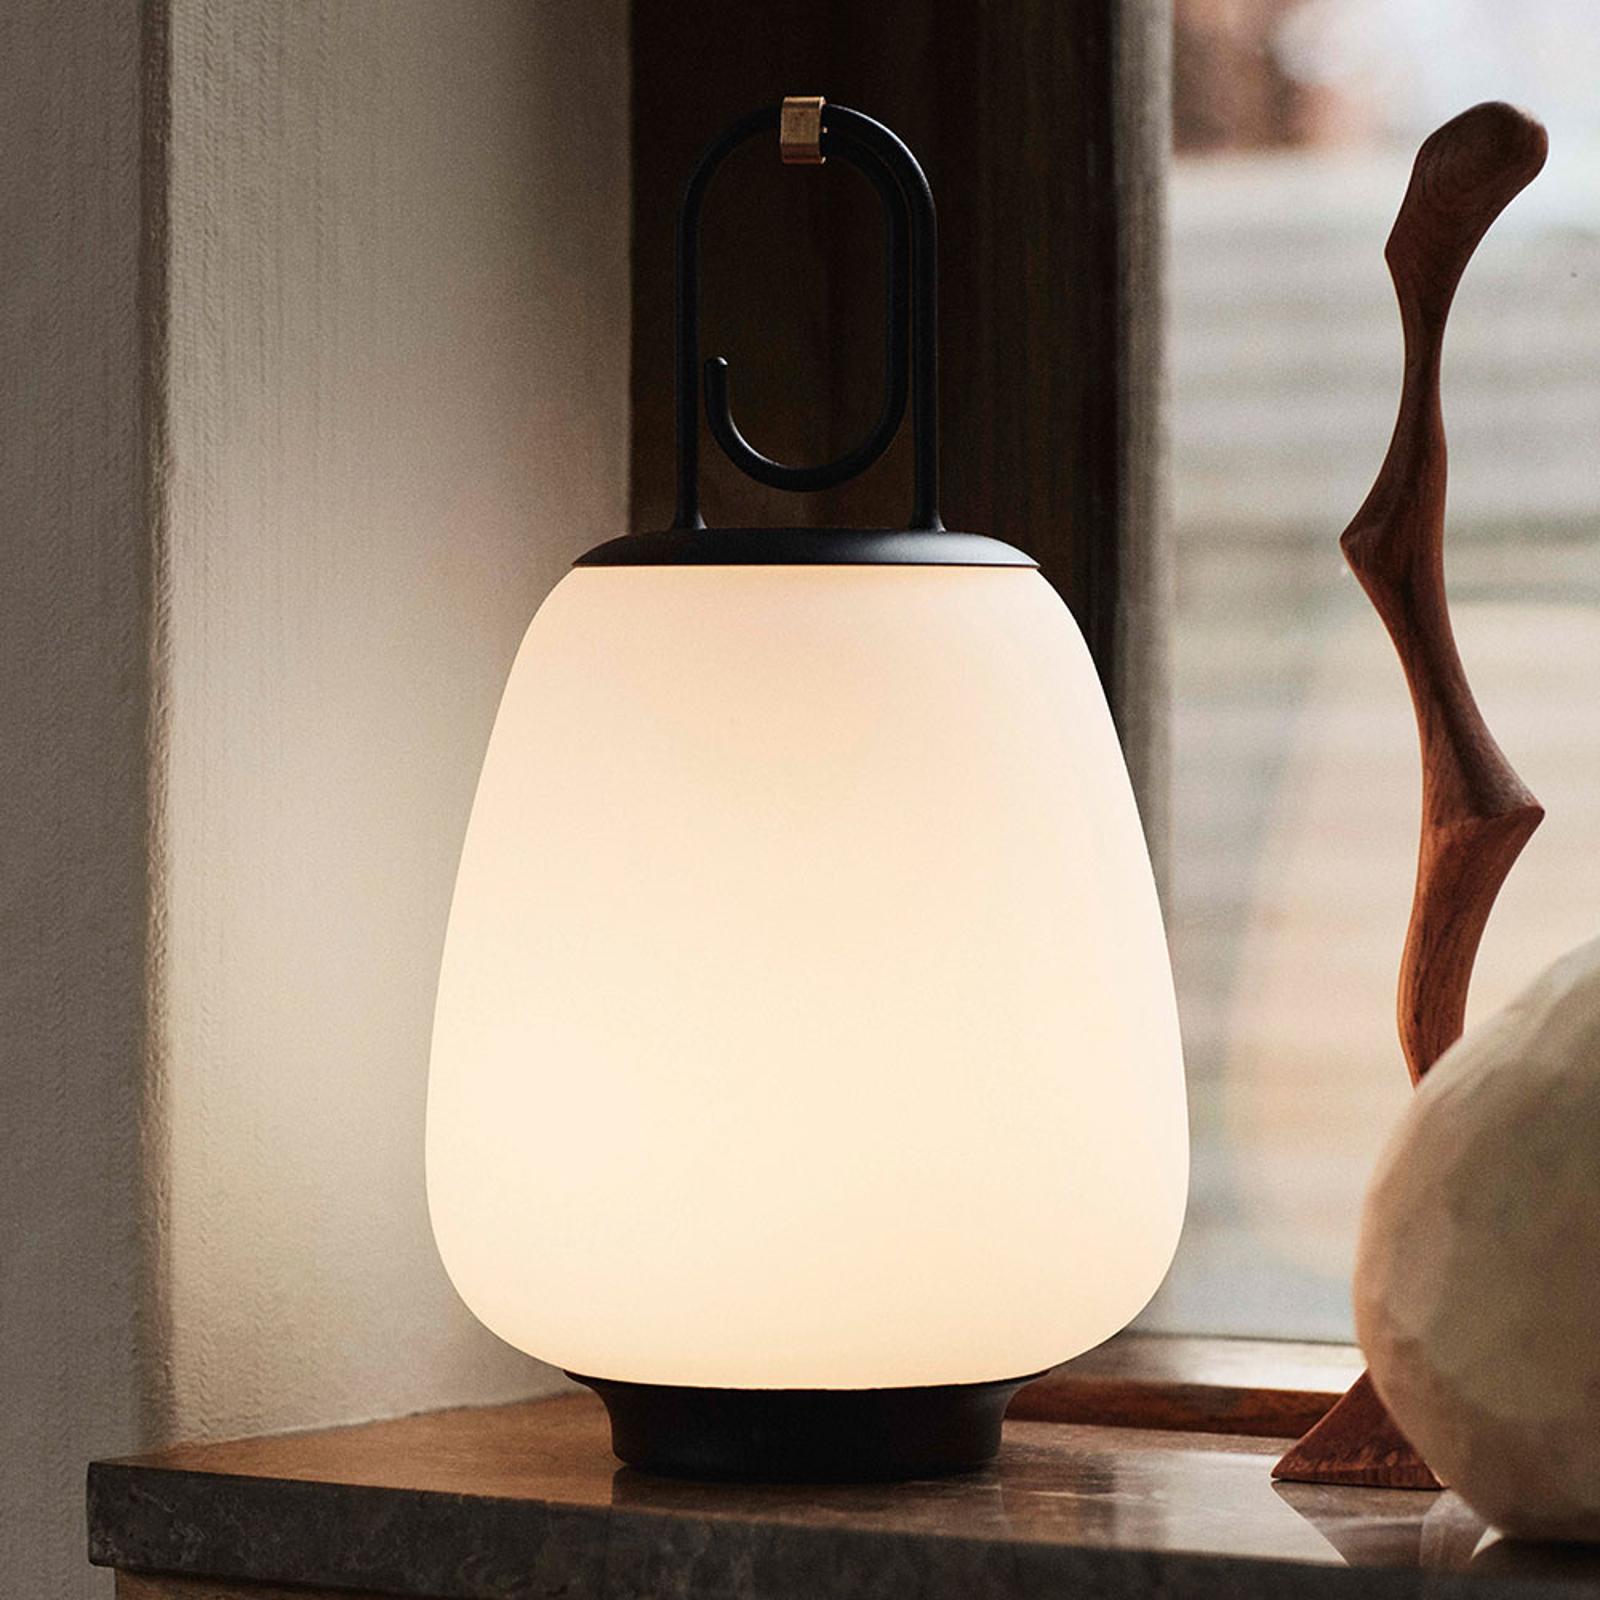 &Tradition Lucca SC51 bordslampa IP44 svart